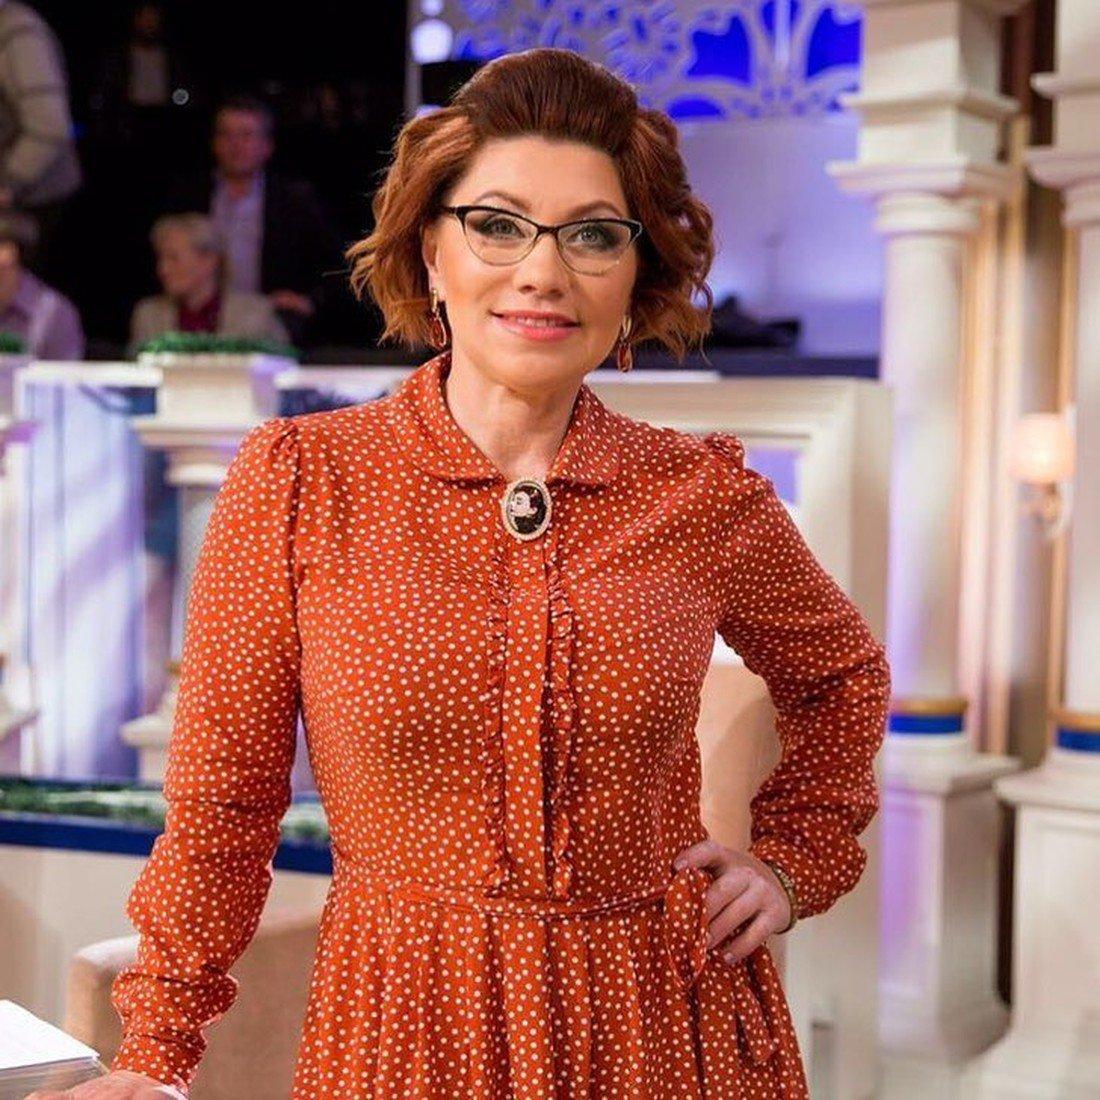 Roza Syabitova came to the show